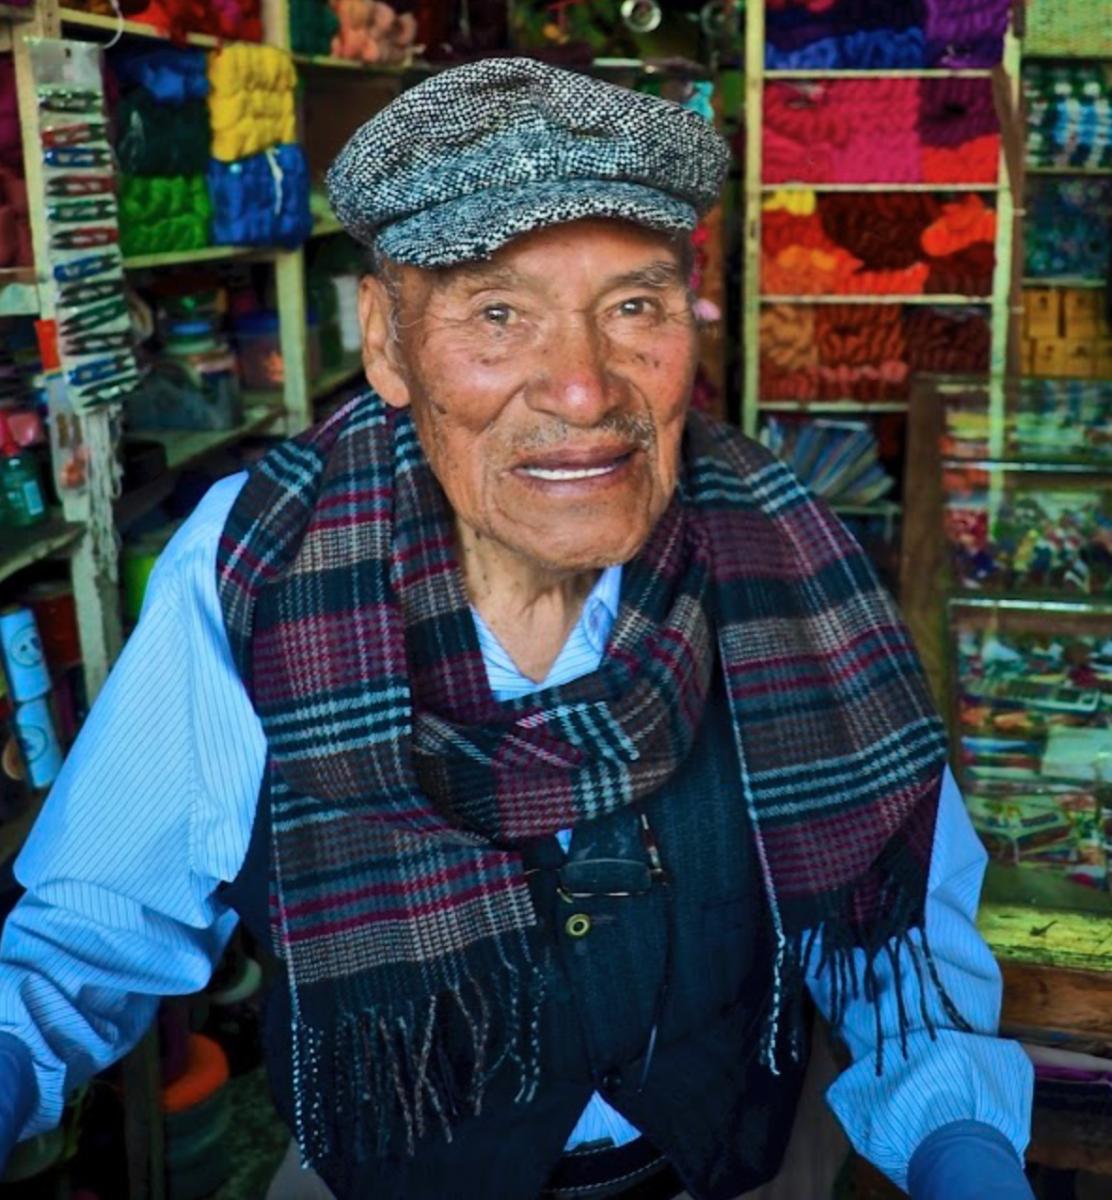 A vendor in Quetzaltenango, Guatemala